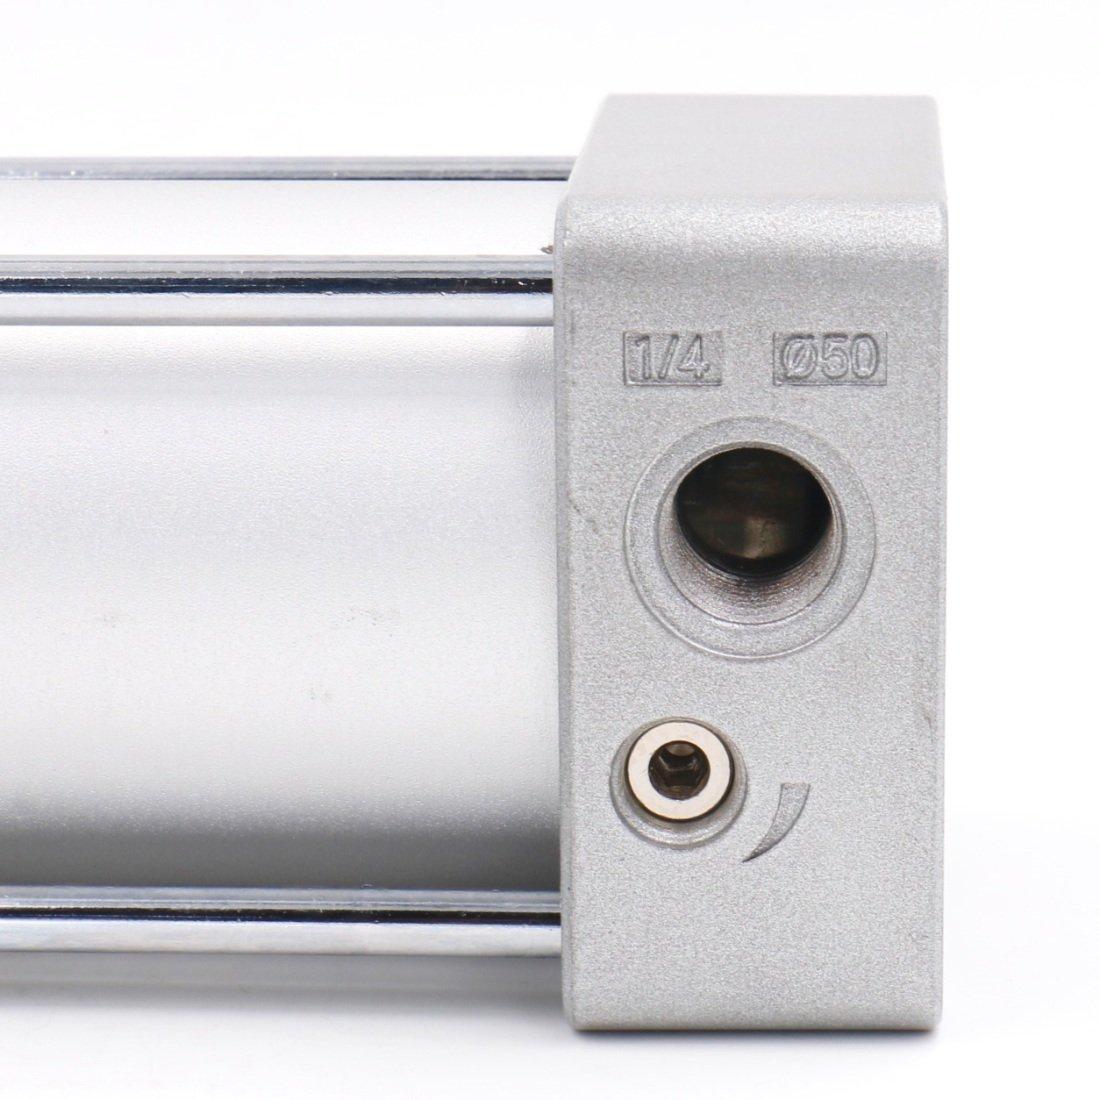 SC 160x150 aire cilindro piston neumatico cilindro aircylinder CTCE 160x150